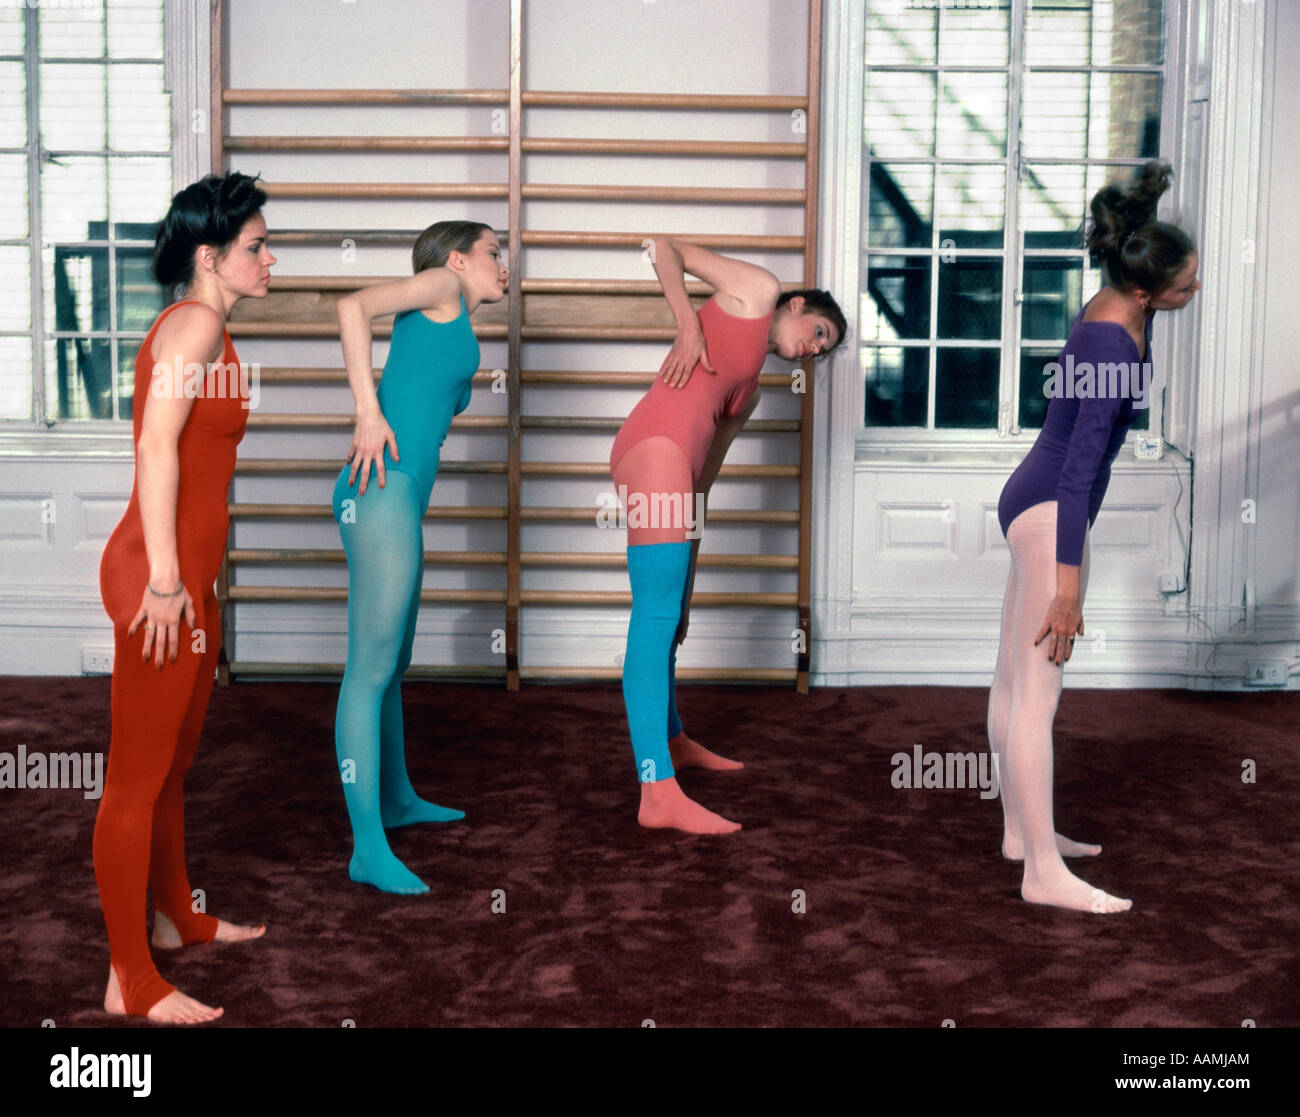 1970 1970s 4 WOMEN GROUP PASTEL LEOTARDS TIGHTS LEG WARMERS WARMING UP GYM  BALLET BAR STUDIO EXERCISE WARMUP AEROBICS 3330a453d6c